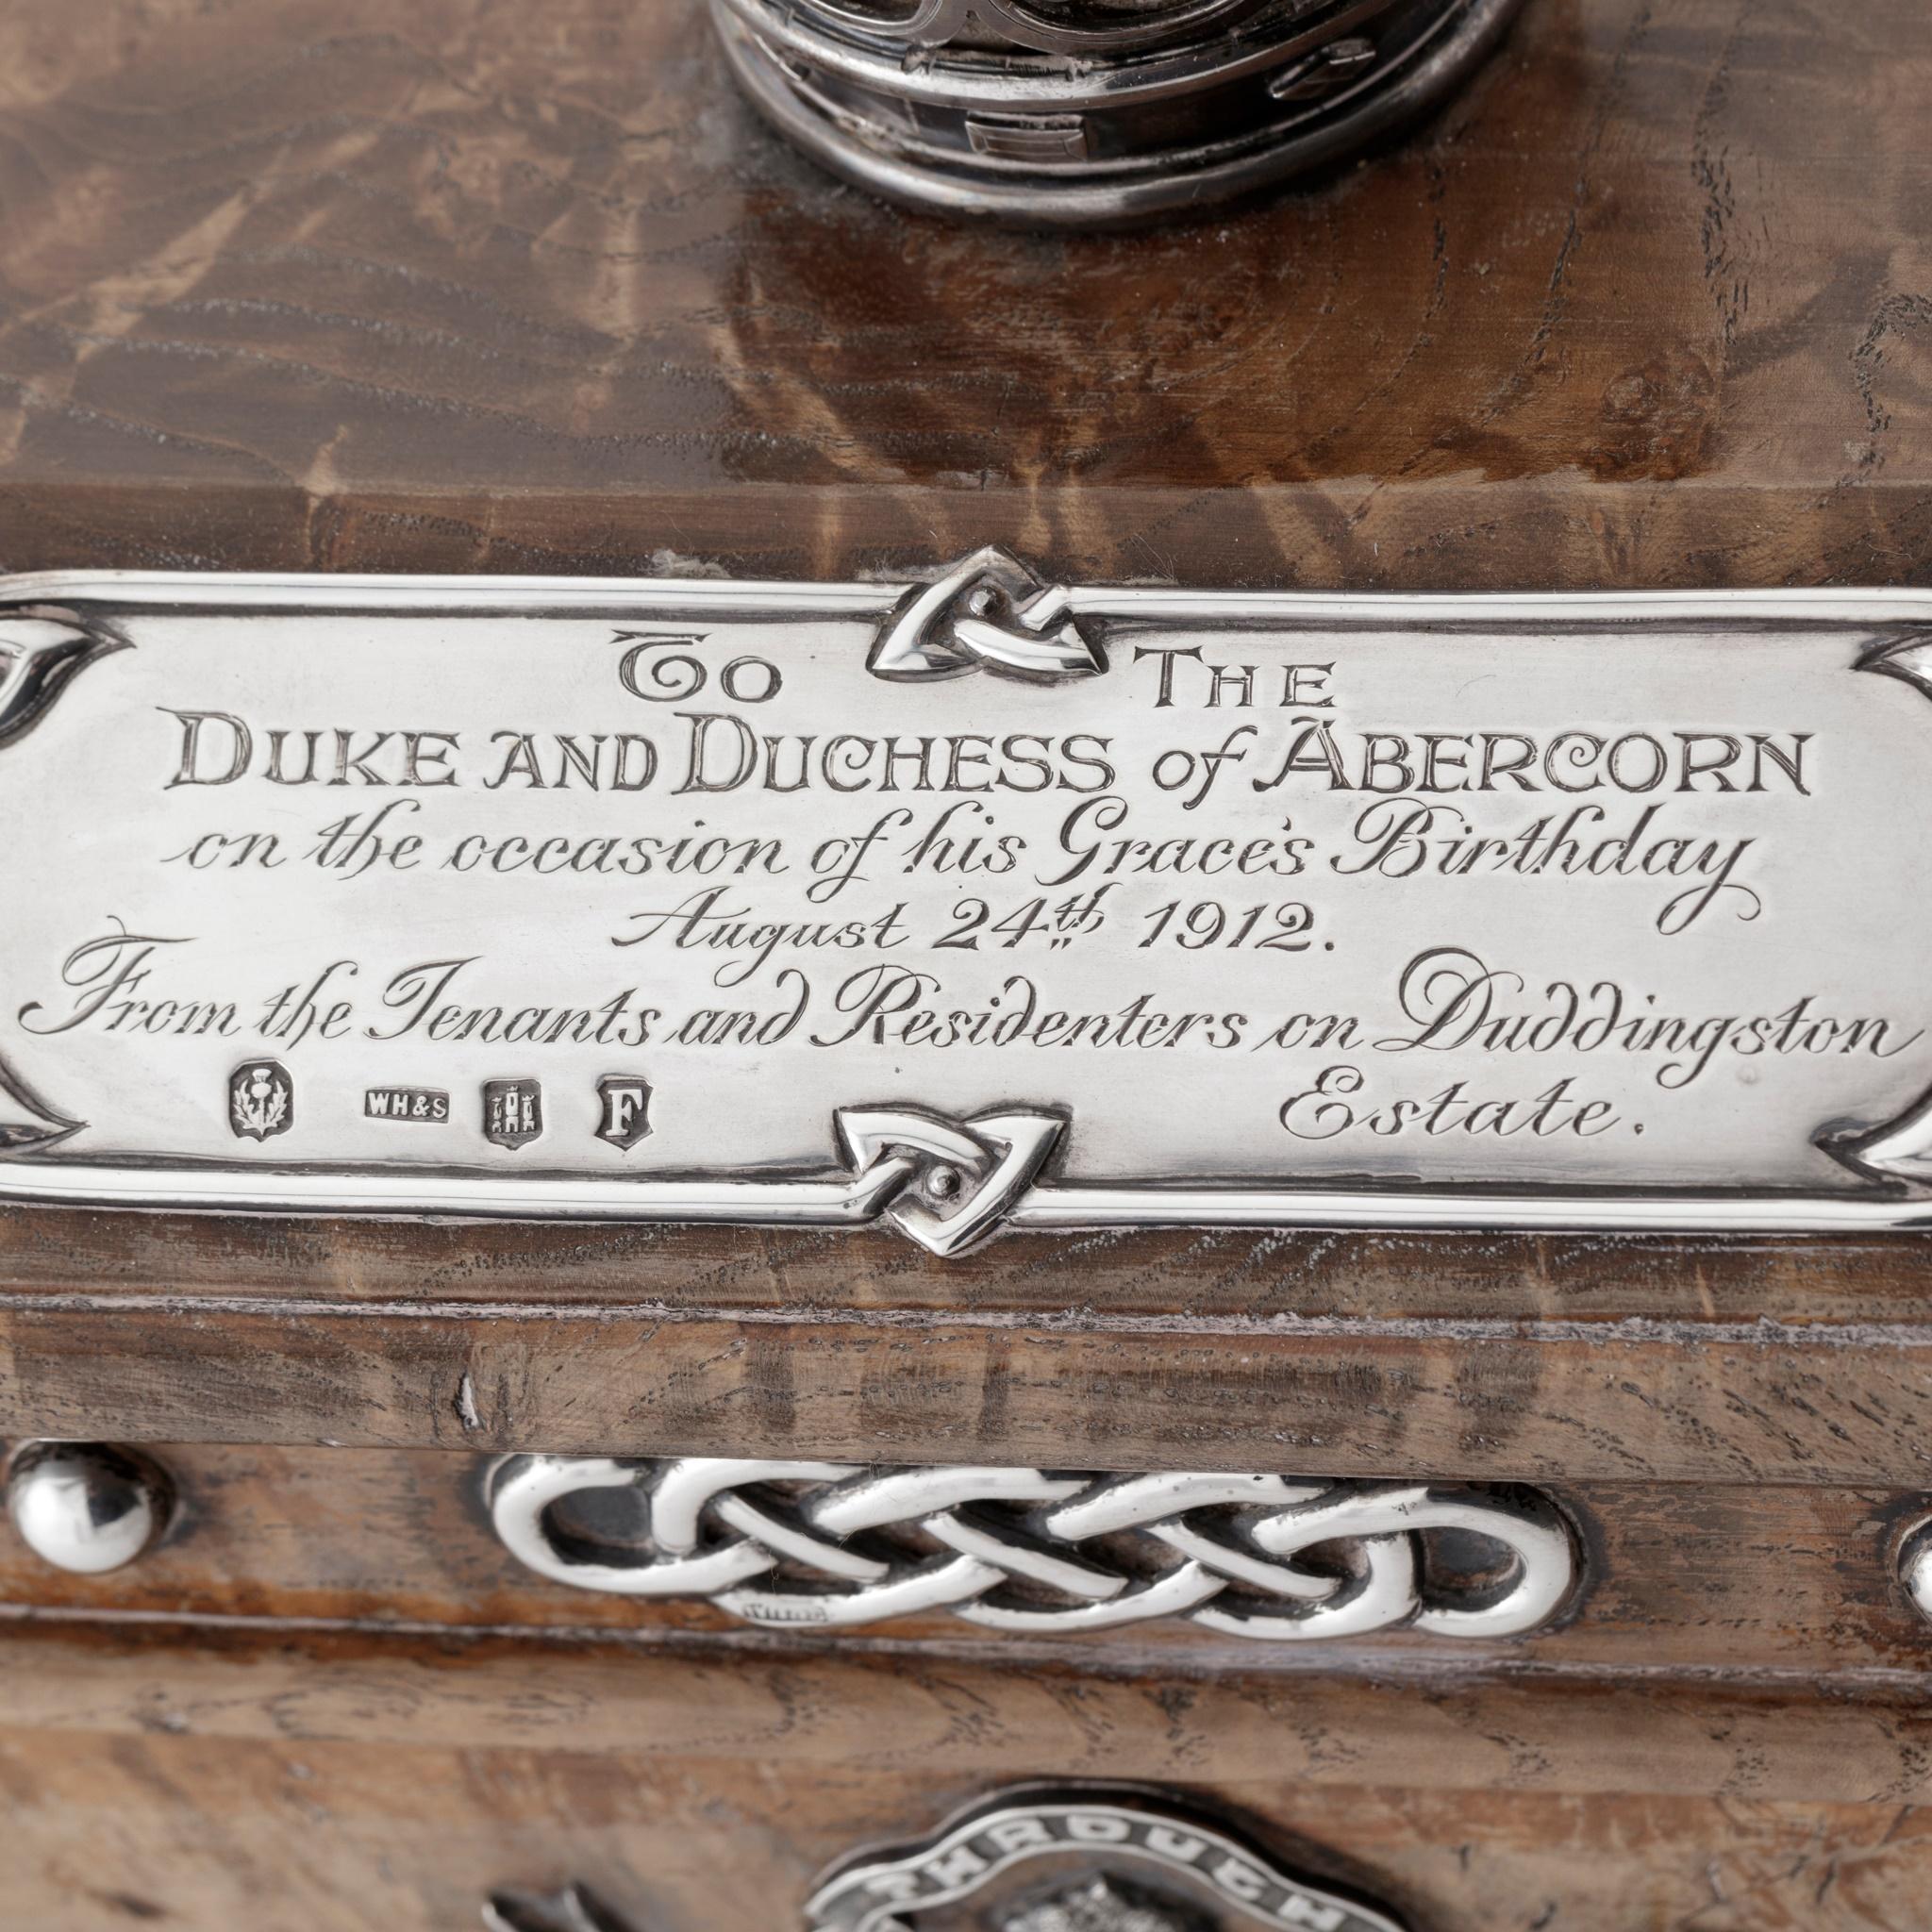 A GEORGE V DUCAL PRESENTATION BOX WILLIAM HAMILTON & SONS, EDINBURGH 1911 - Image 2 of 6